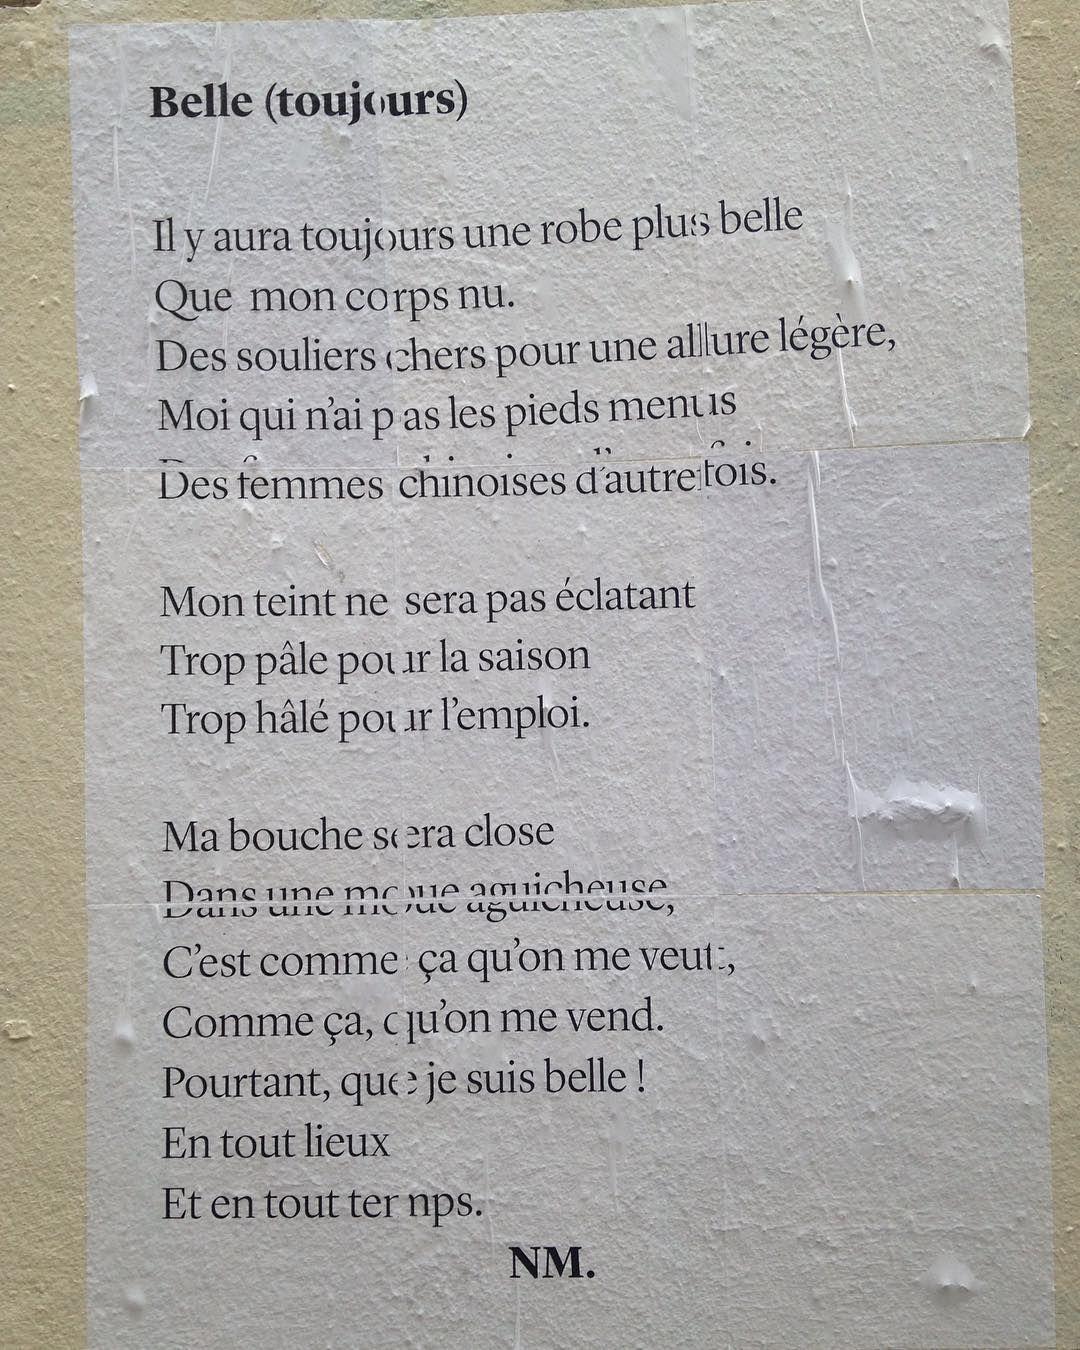 #poeme #mots #words #sens #streetart #streetarteverywhere #streetartphotography #wall #bordeaux #bordeauxmaville #belle #beauty #instagram #instagramers #instadaily #reflection #poet #poemoftheday #poemsofinstagram by slepolard